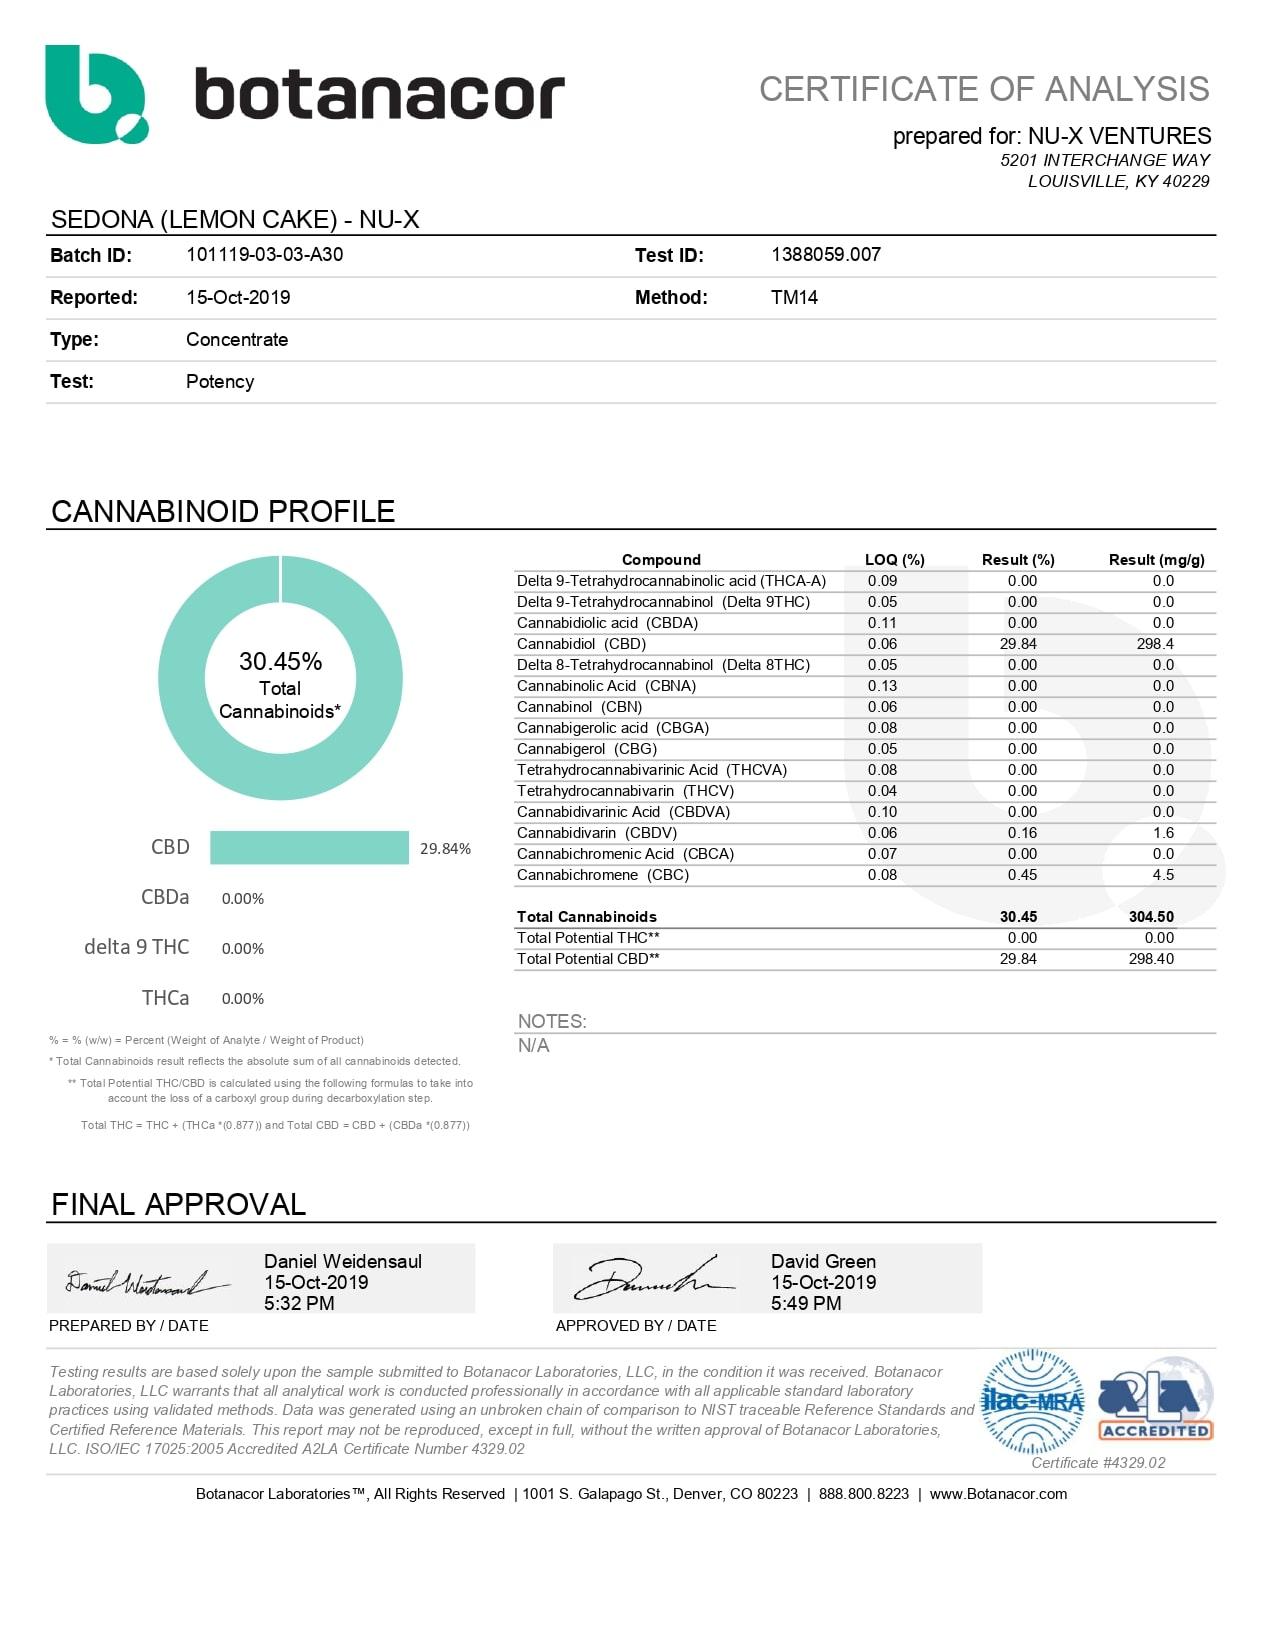 NU-X CBD eLiquid Concentrate Lab Report | Lemon Cake - Sedona 3000mg